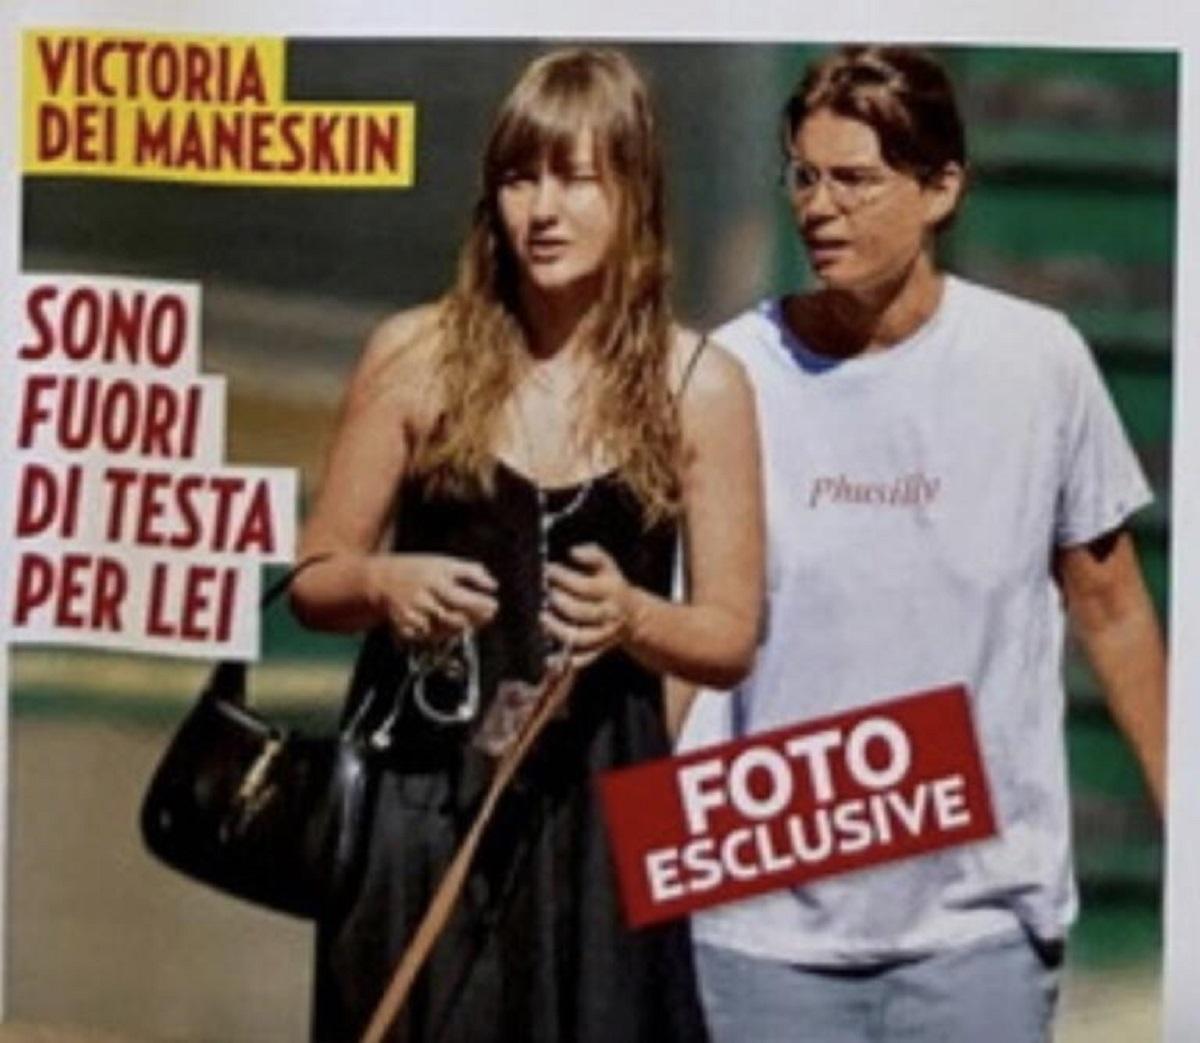 Victoria De Angelis Maneskin foto fidanzata